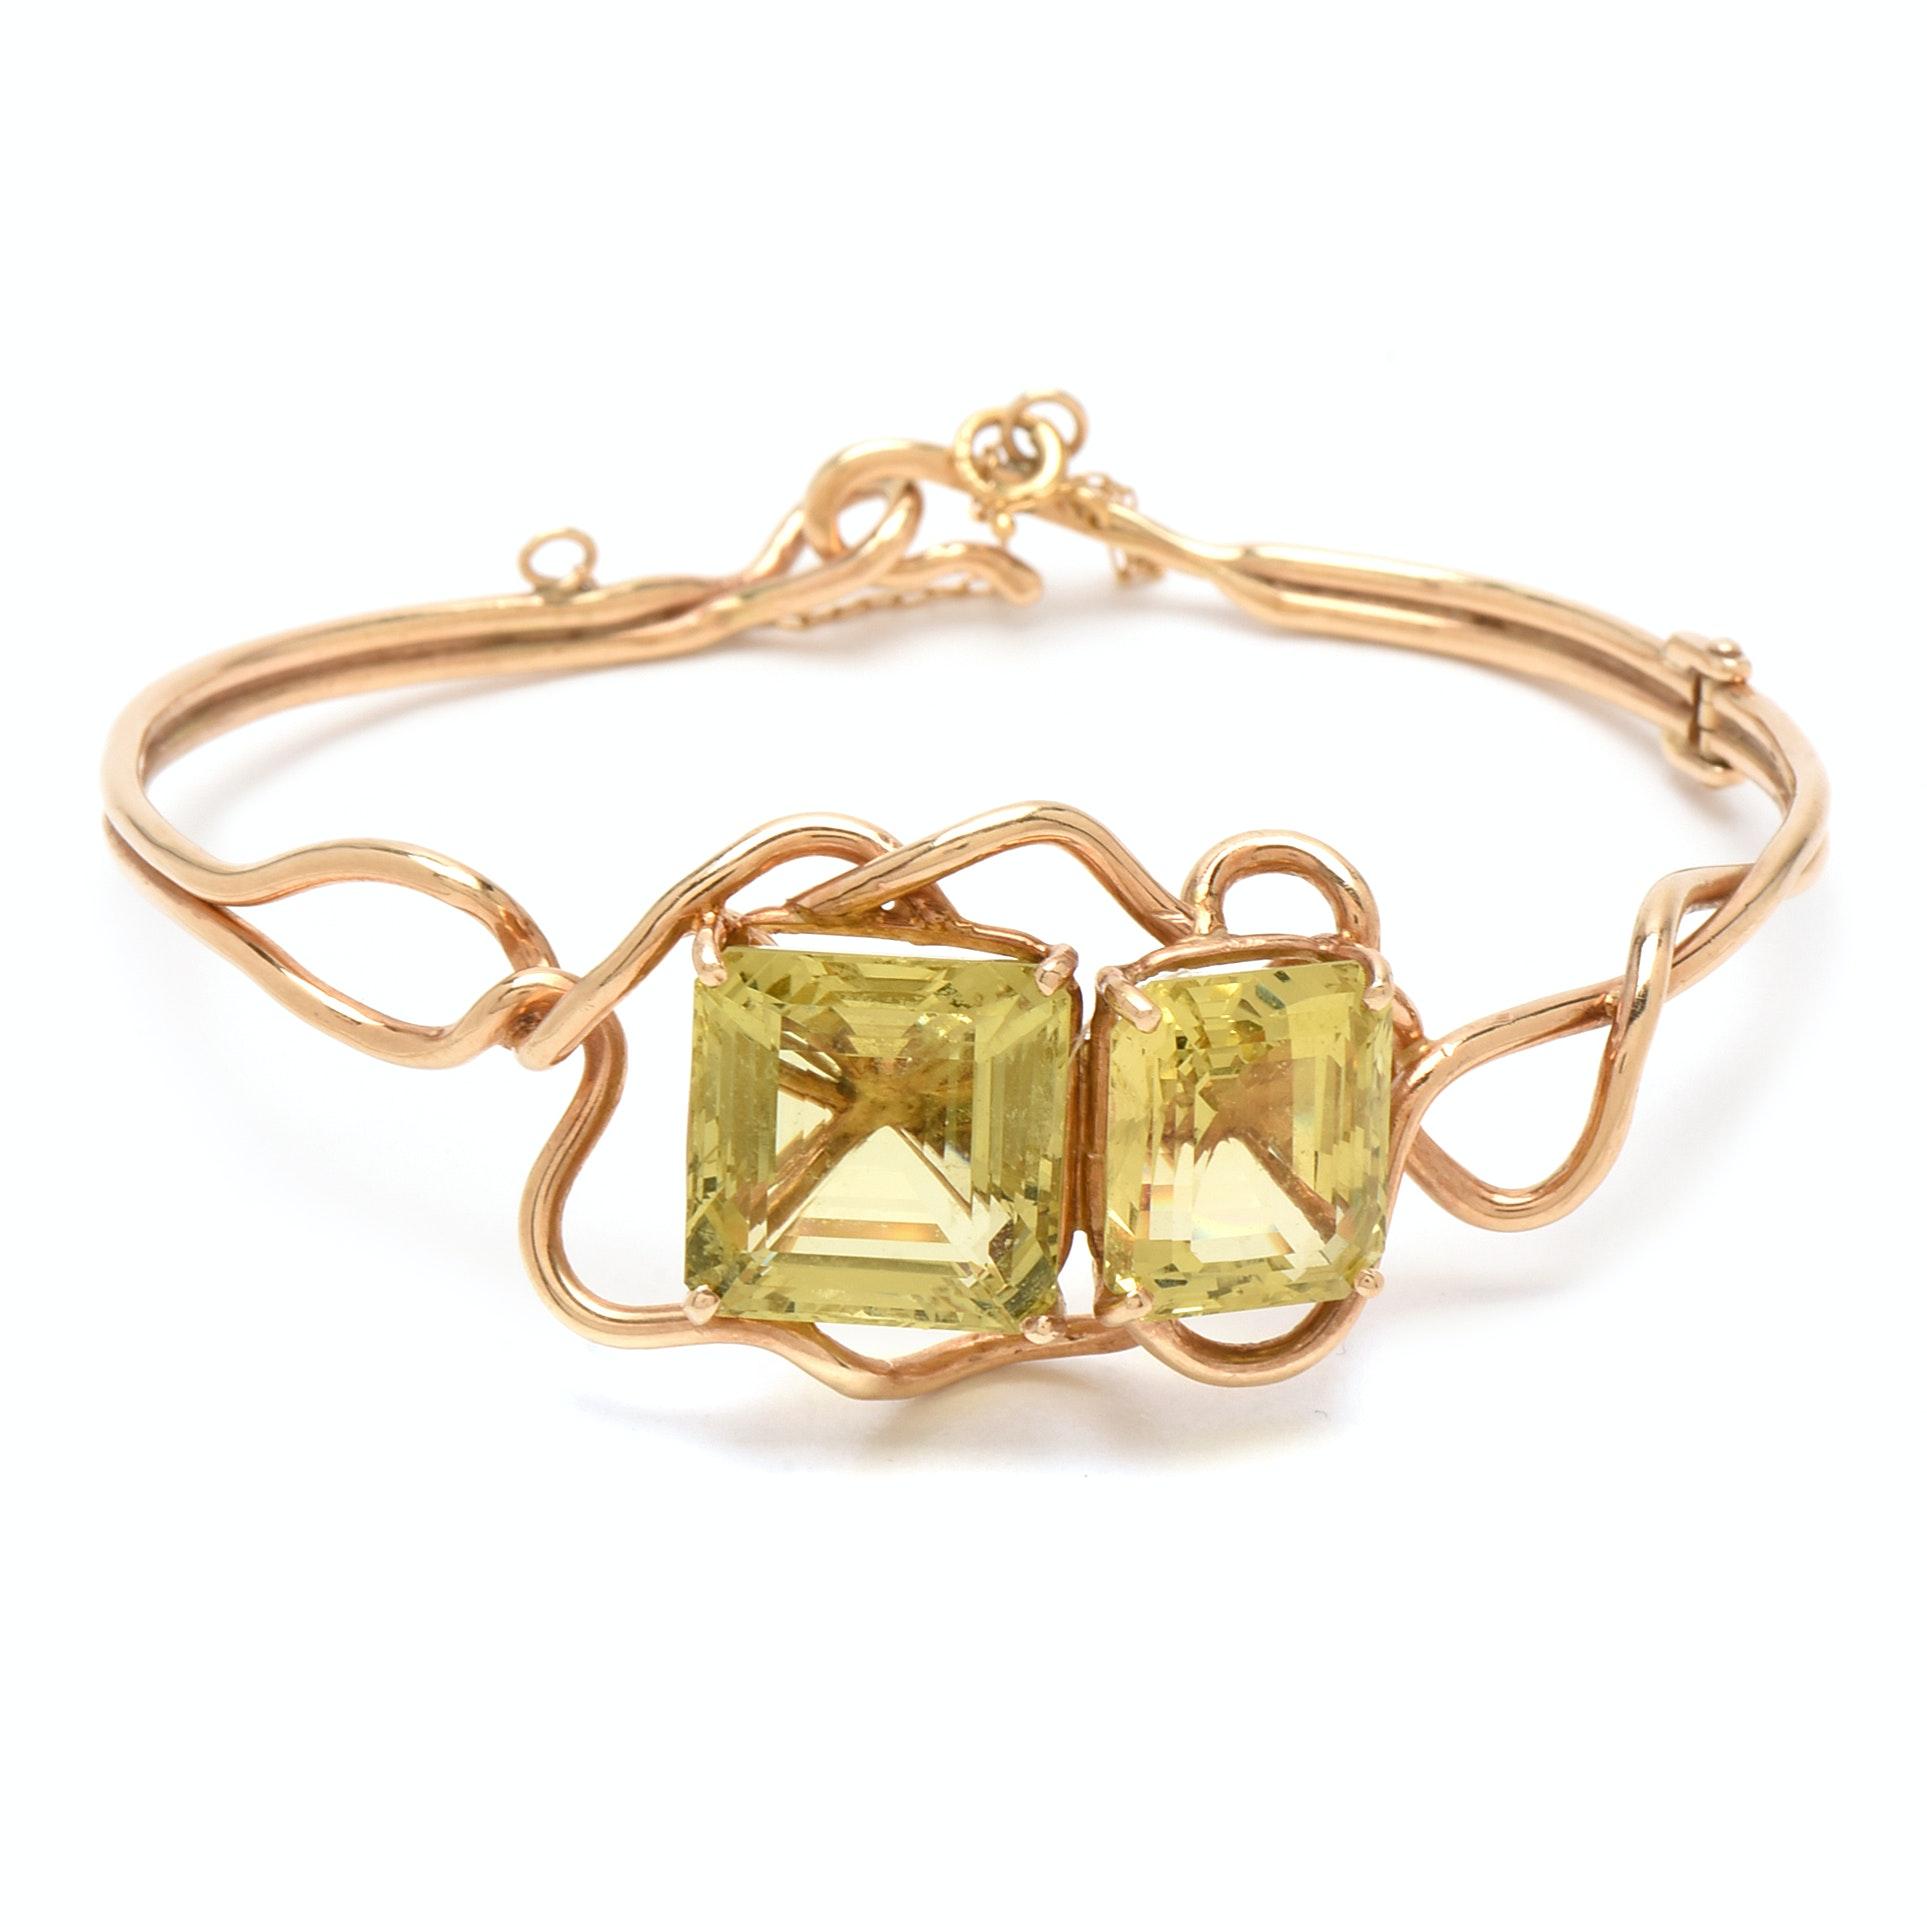 14K Yellow Gold Lemon Quartz Organic Style Bracelet